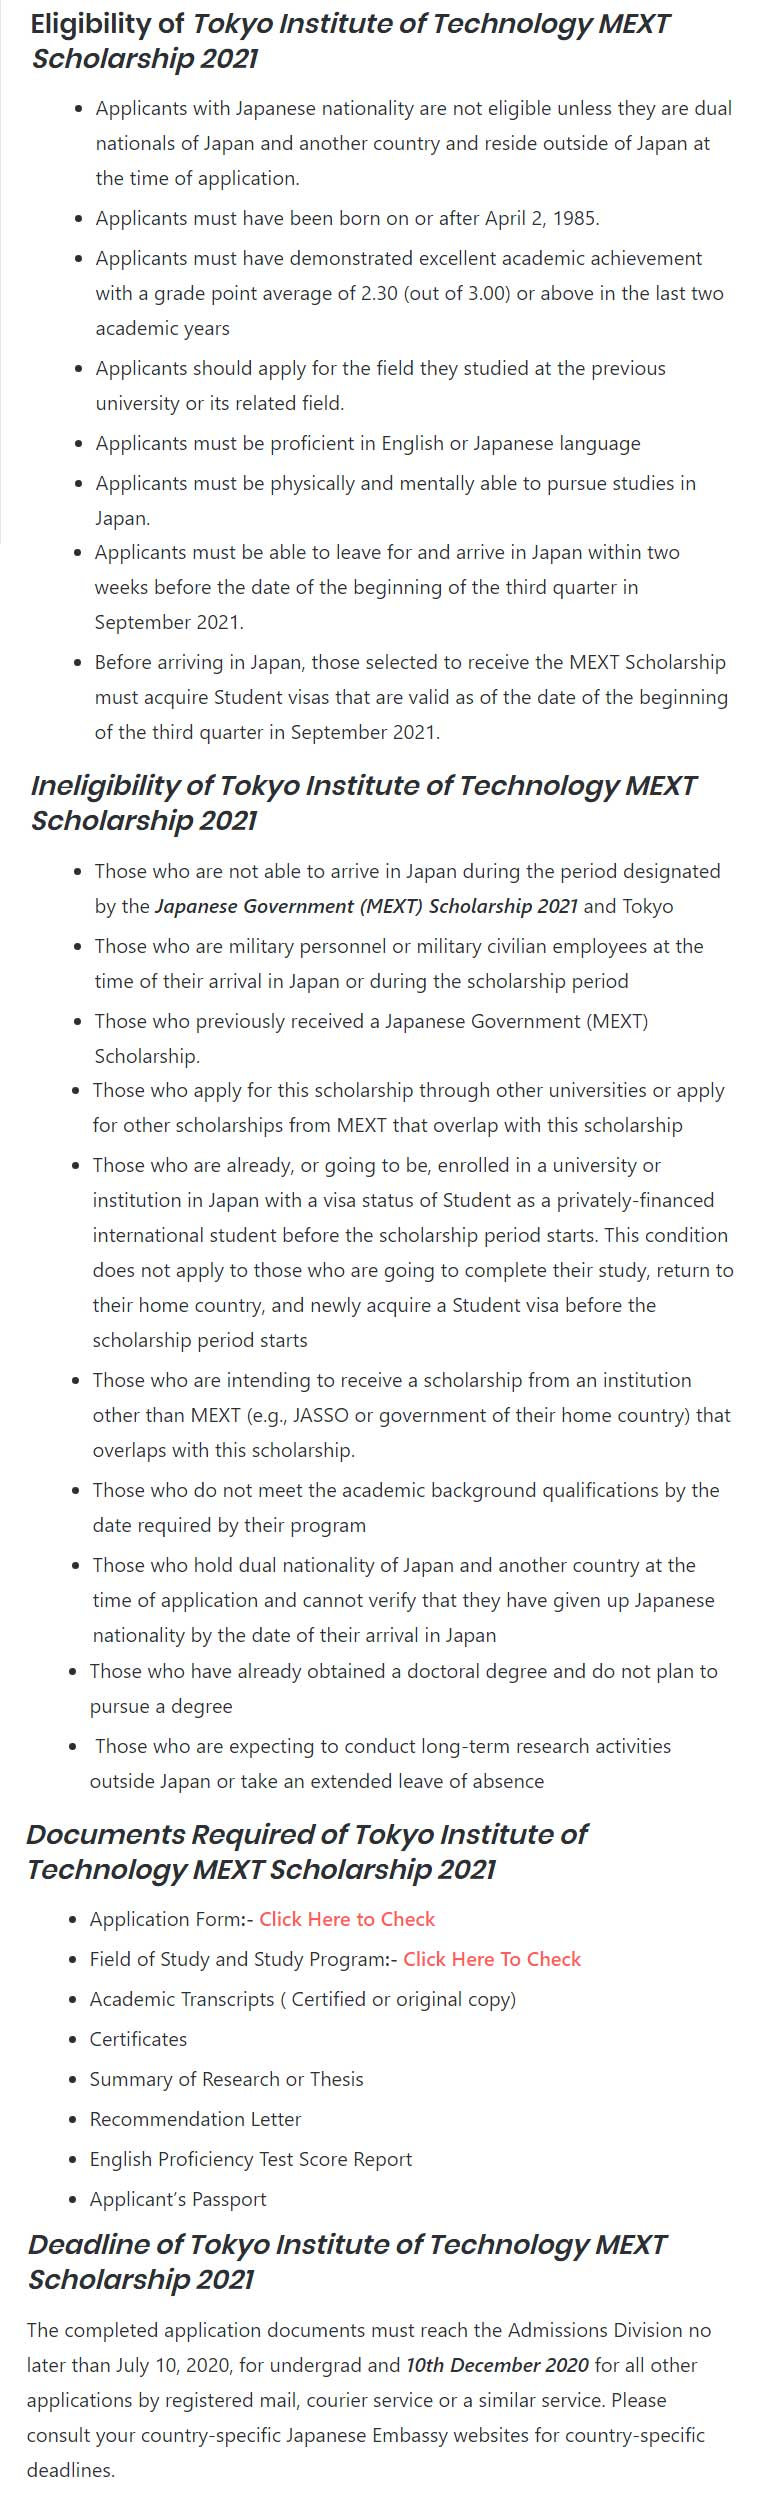 https://ishallwin.com/Content/ScholarshipImages/Japan-MEXT-Scholarship.jpg